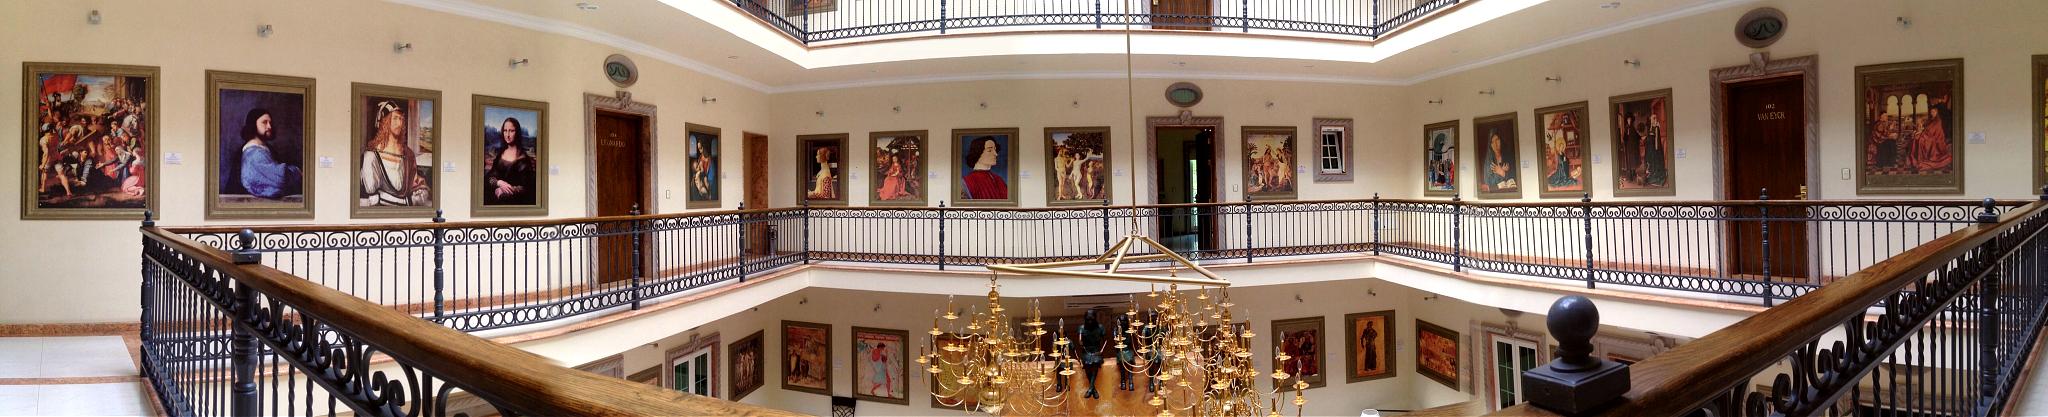 Torre principal villa toscana 10.jpg